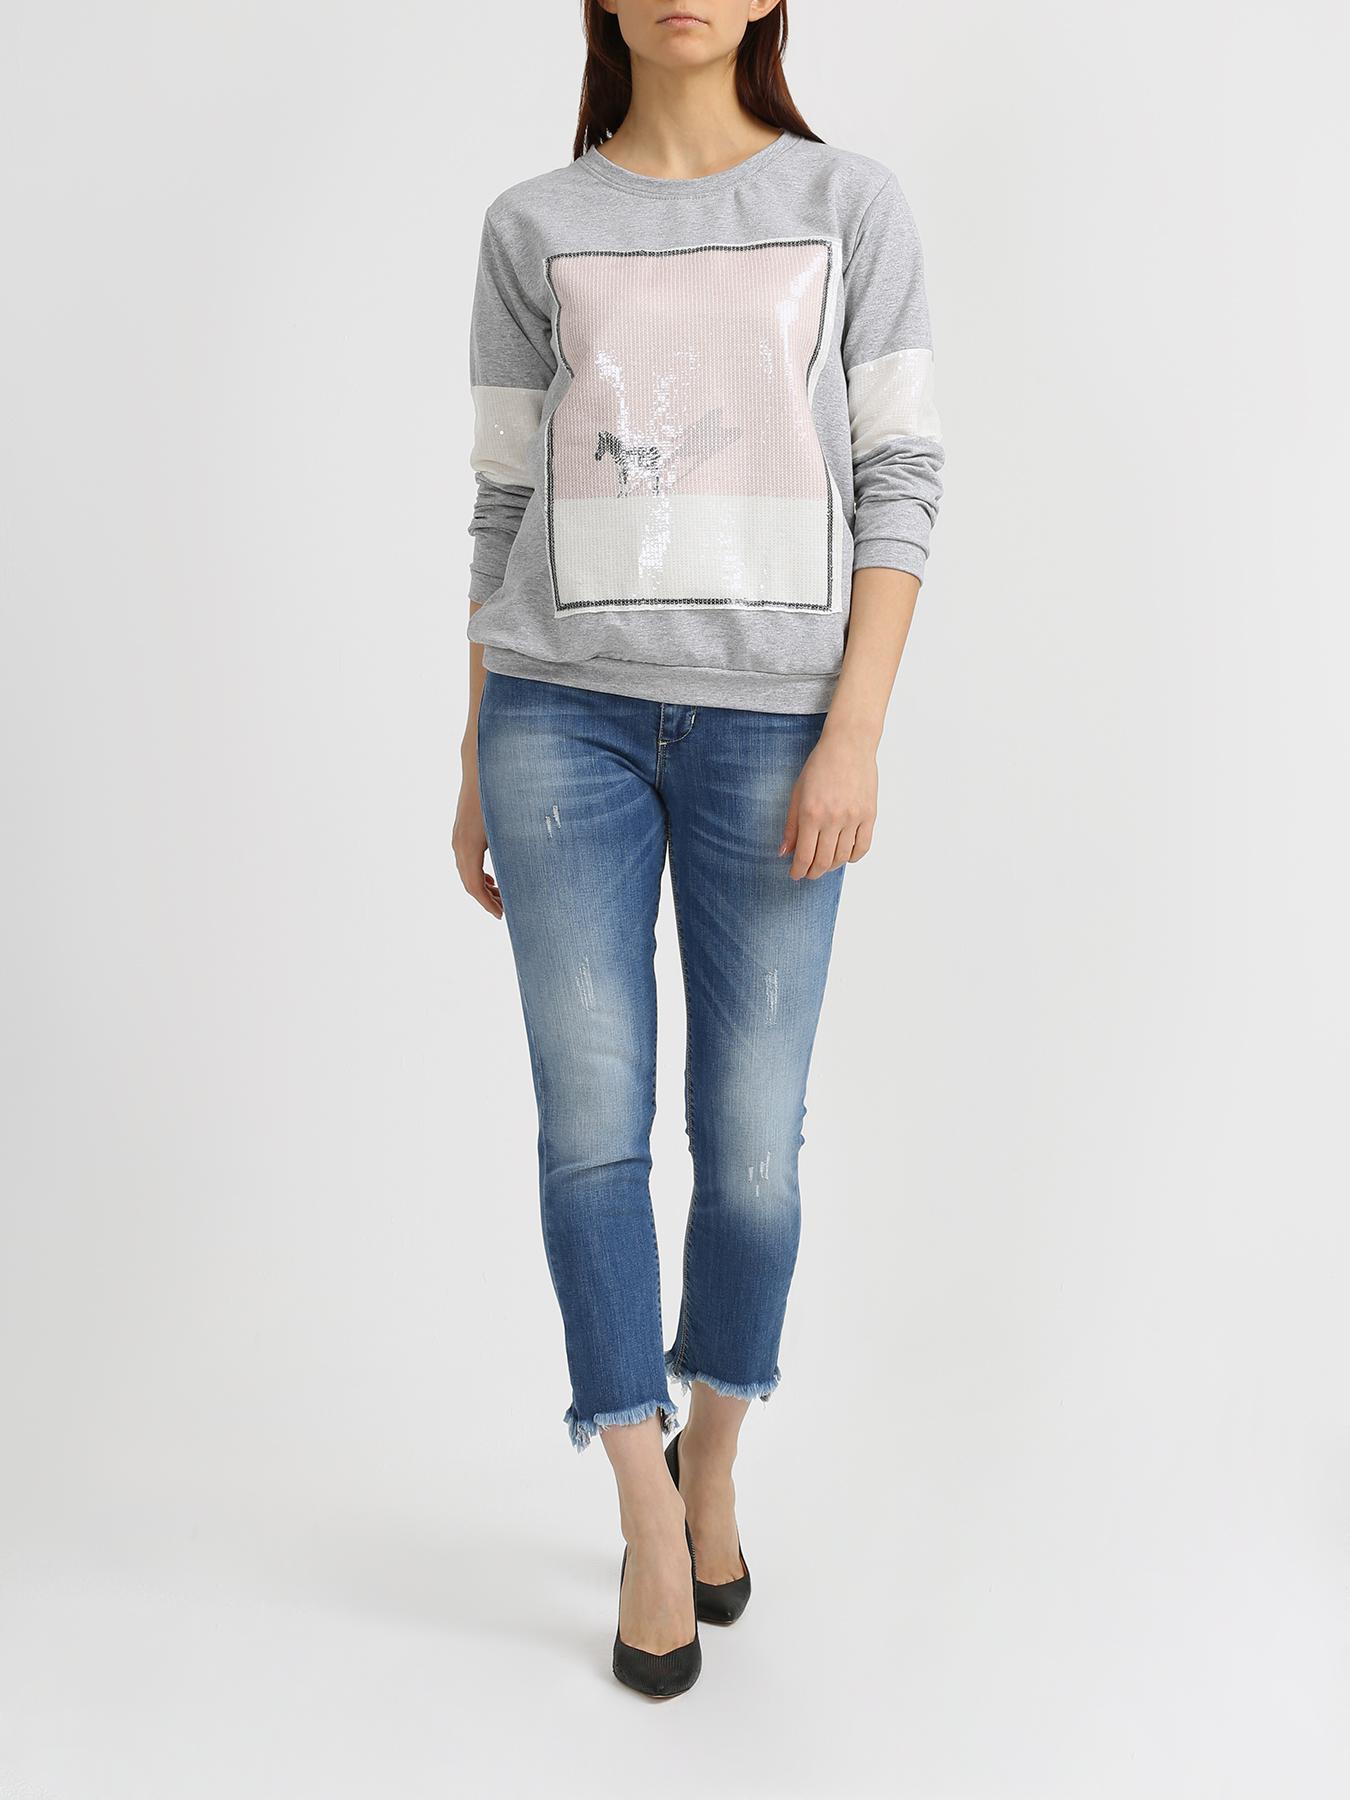 Брюки Rinascimento Укороченные джинсы брюки rinascimento прямые джинсы